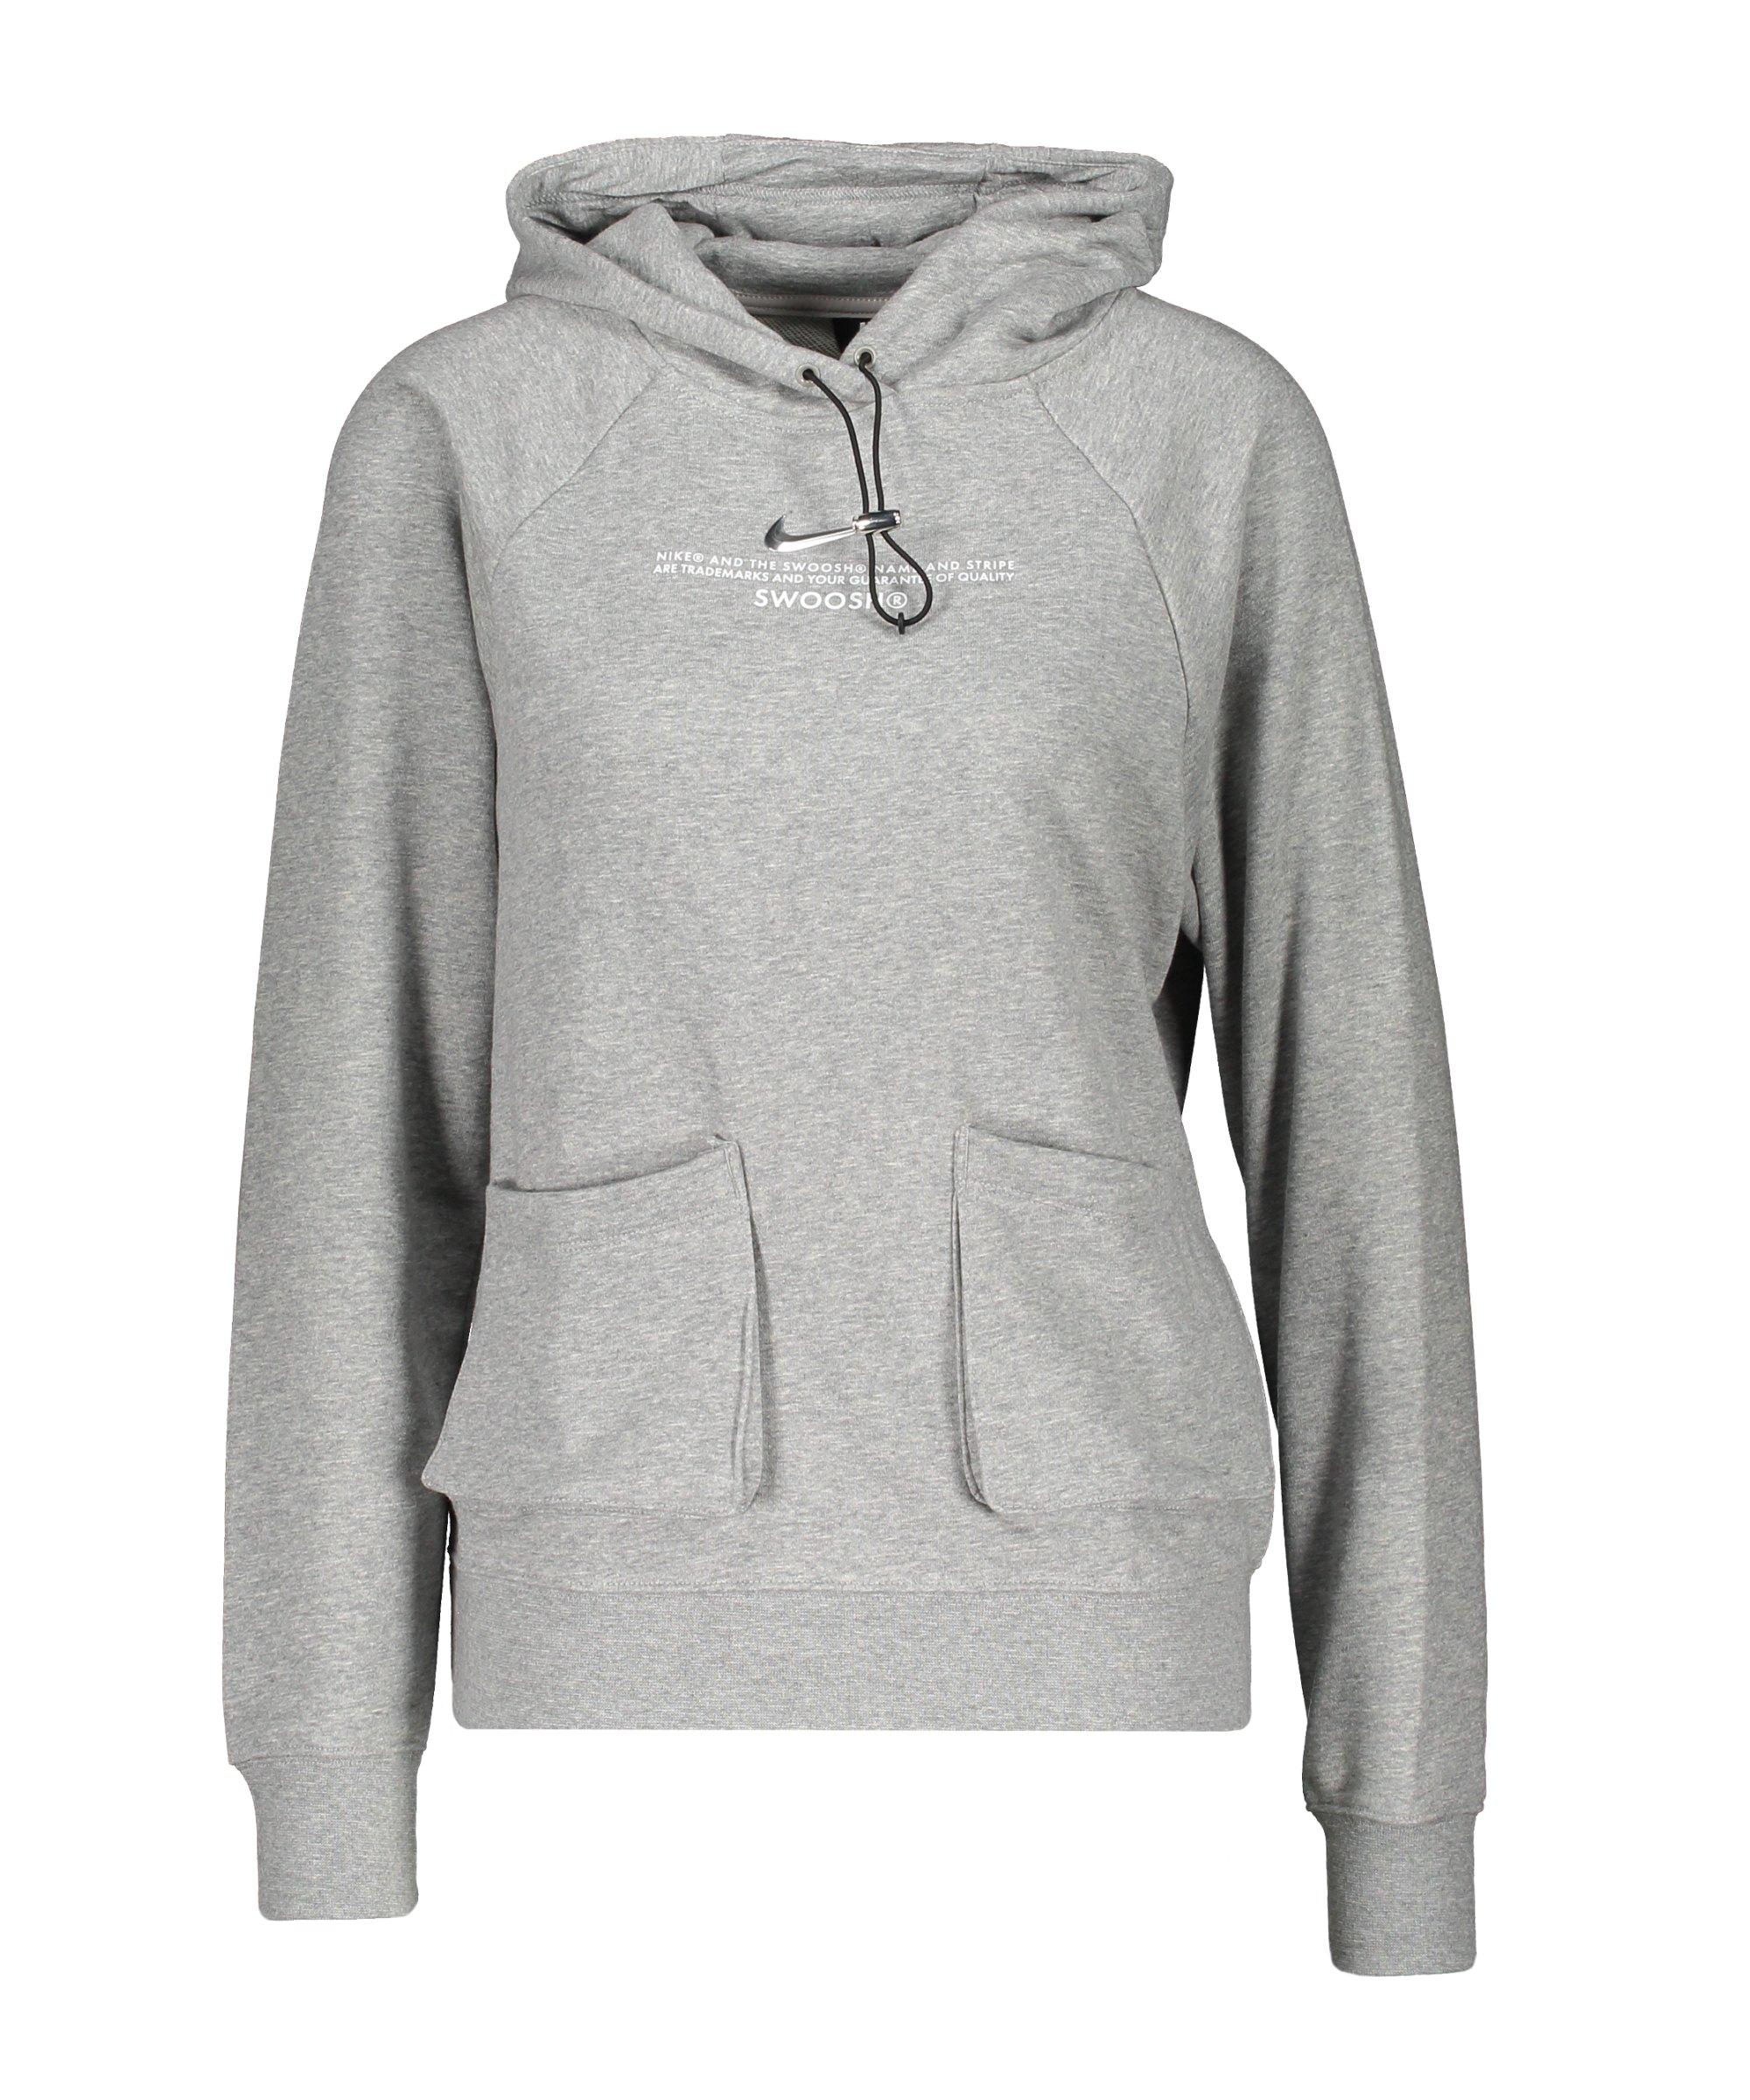 Nike Swoosh Fleece Hoody Damen Grau Weiss F063 - grau